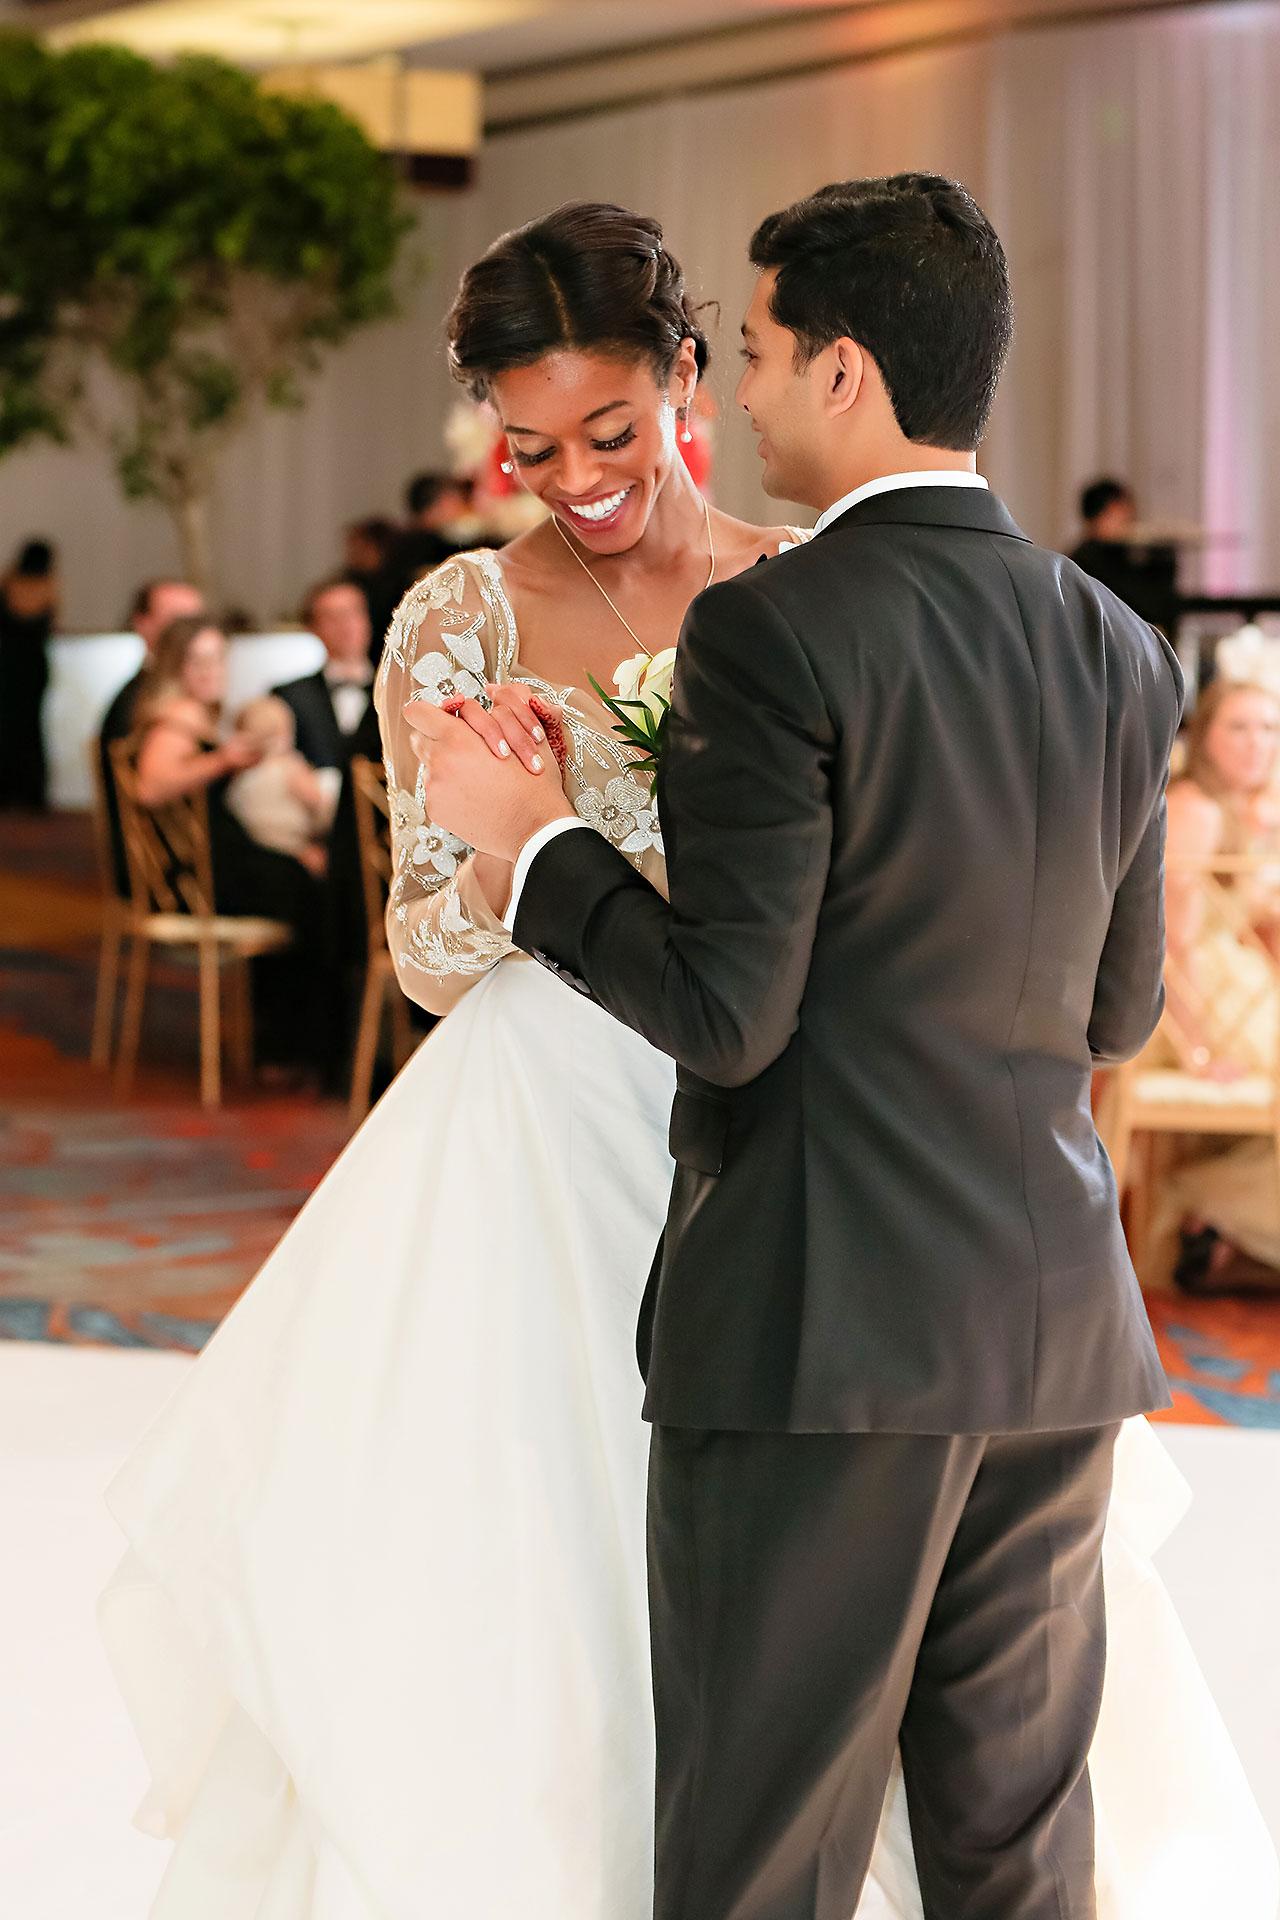 Joie Nikhil JW Marriott Indianapolis Wedding 121